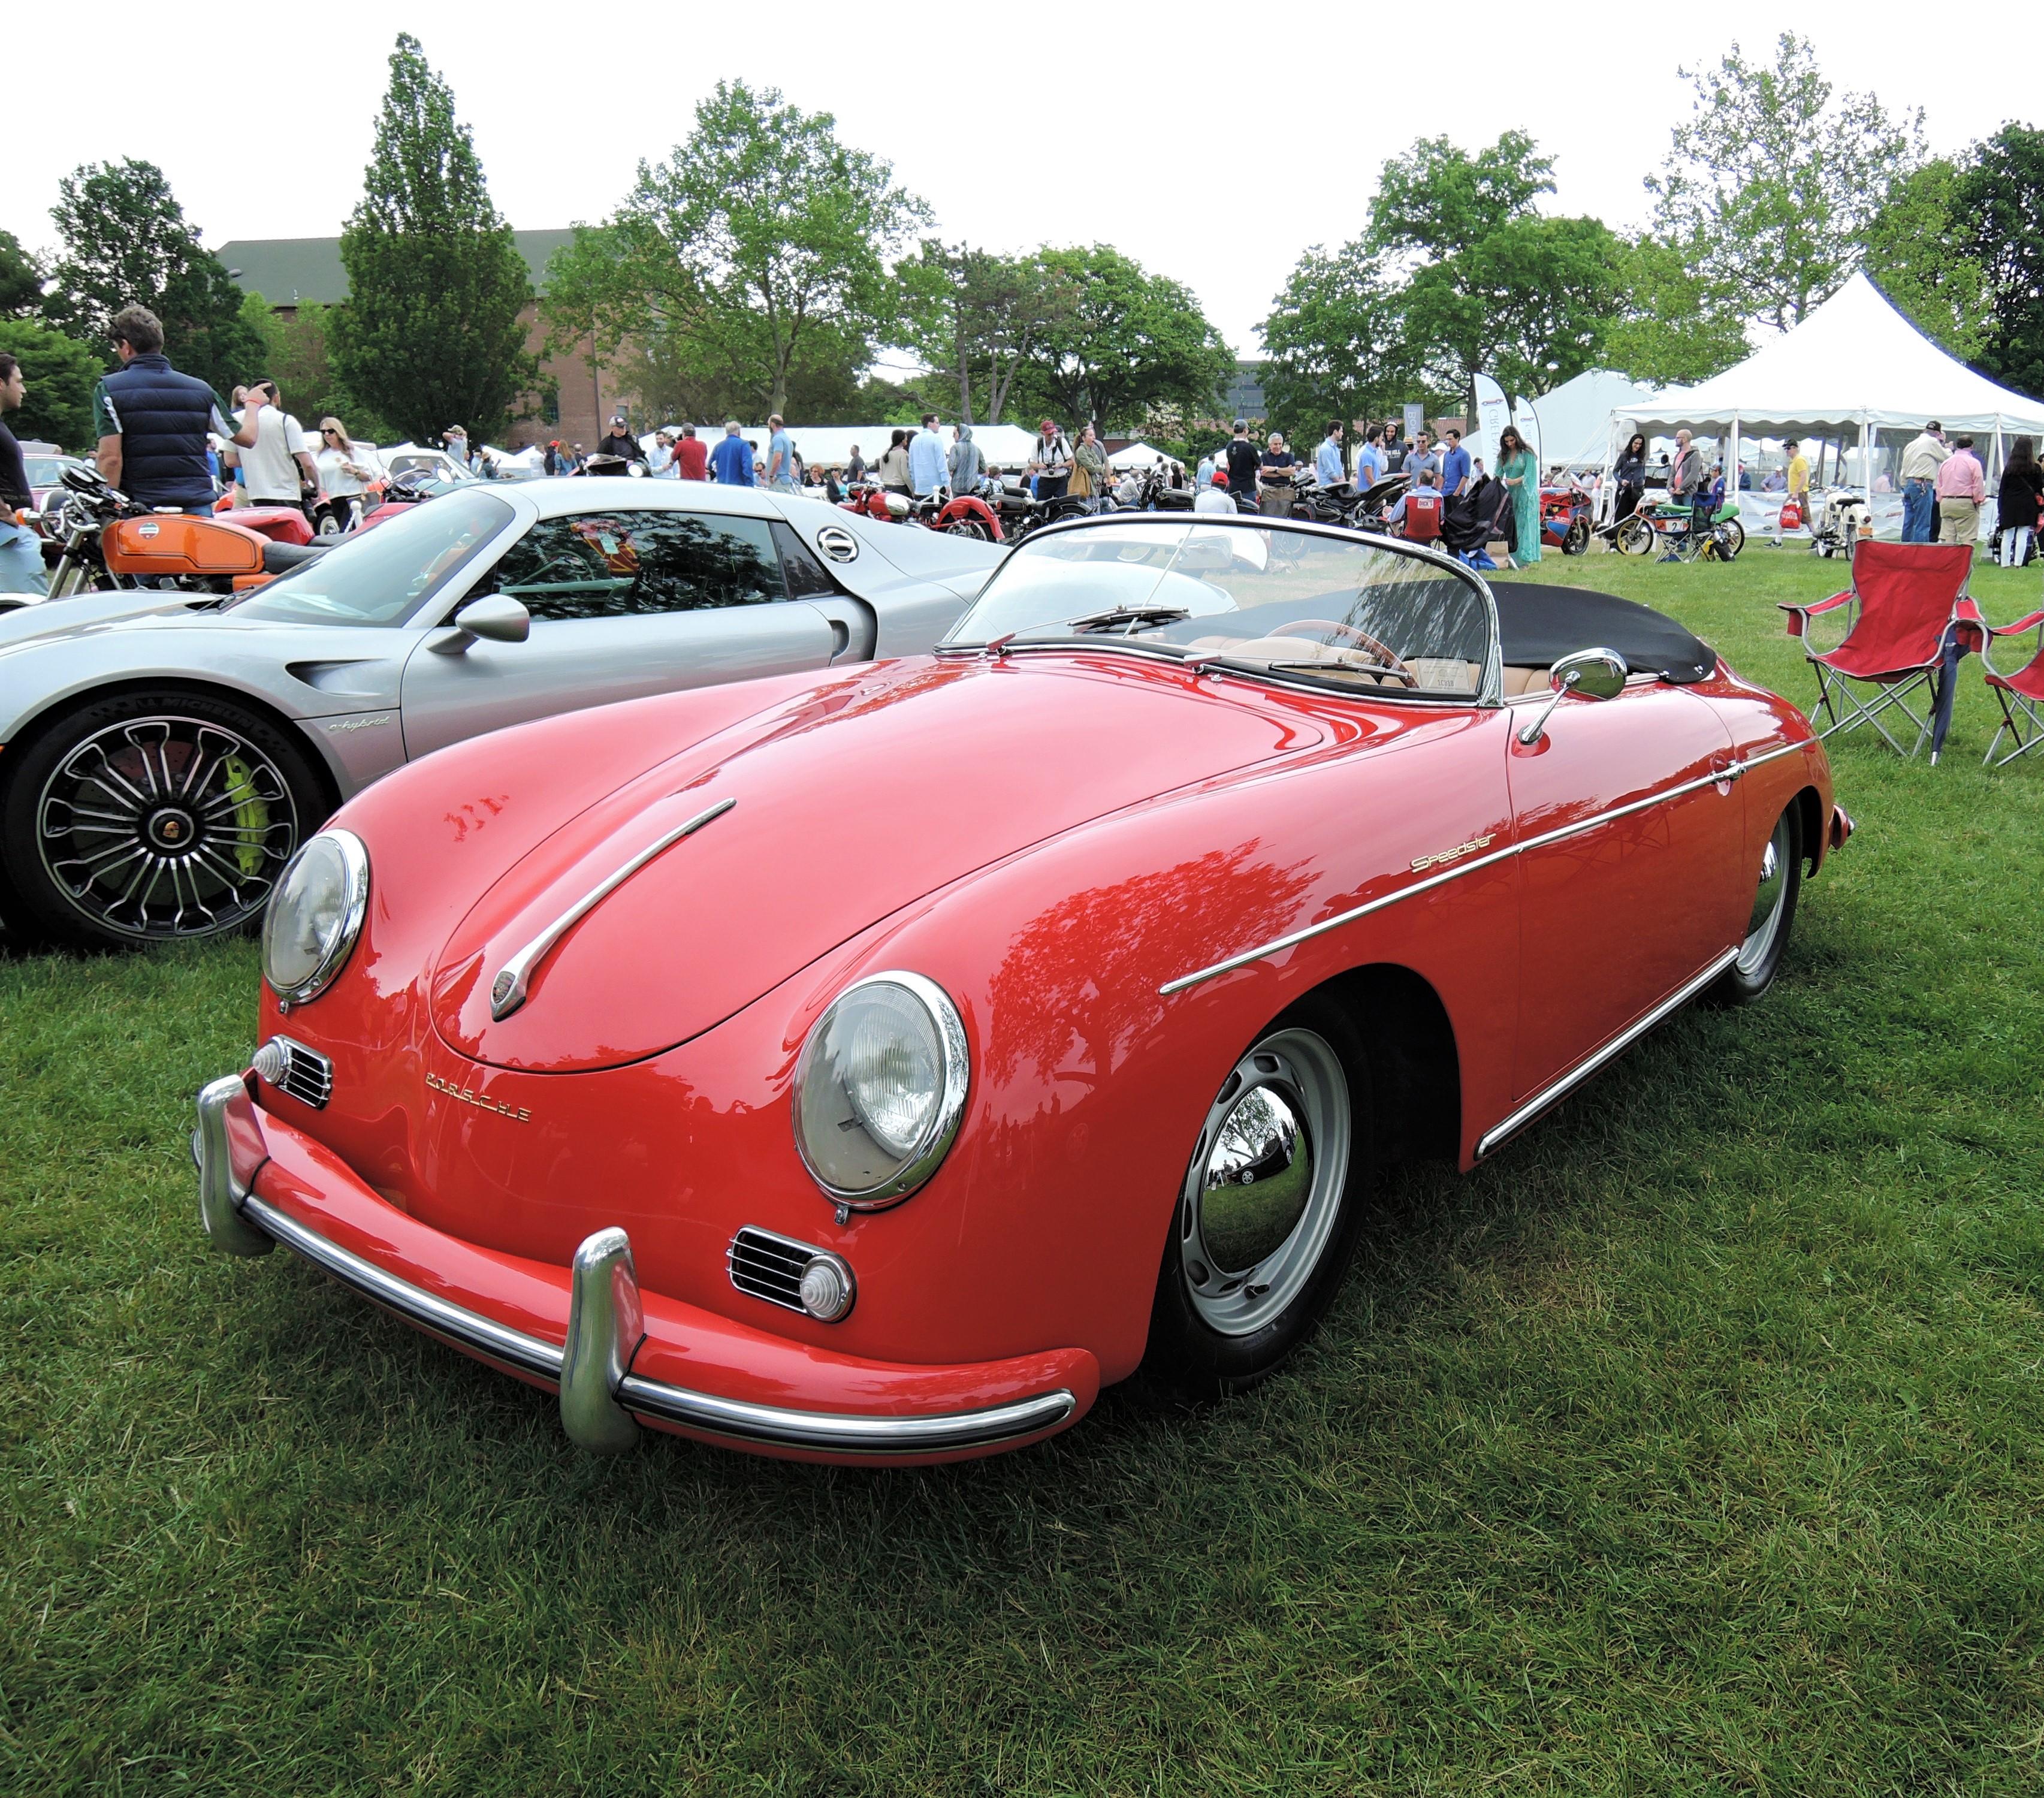 red 1957 Porsche 356A -Greenwich Concours d'Elegance 2017